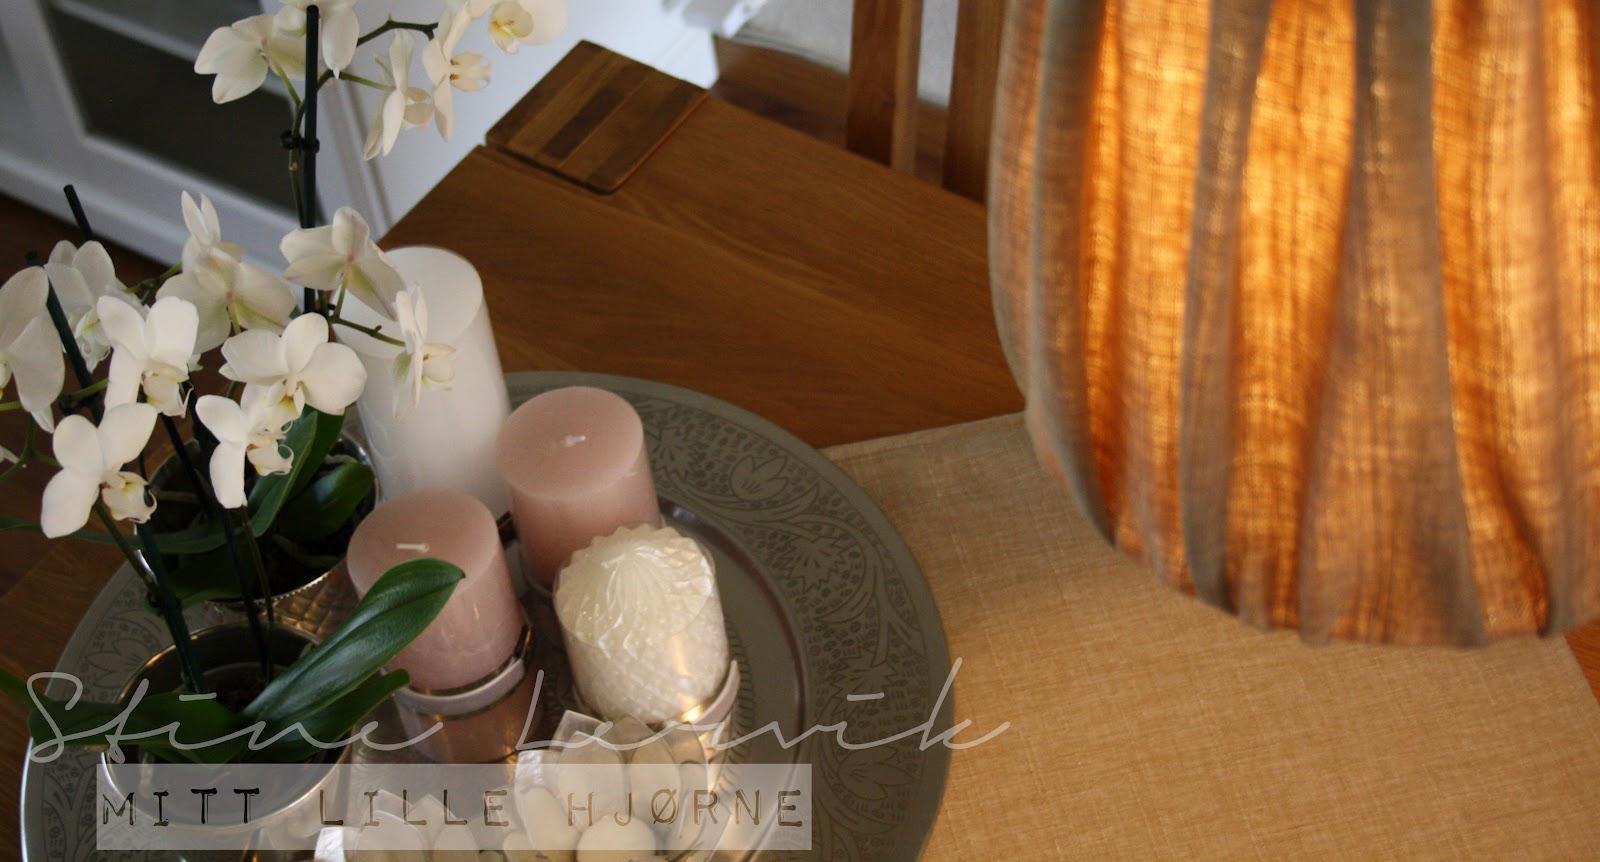 Stine lervik   mitt lille hjørne♥: nye detaljer rundt spisestuen